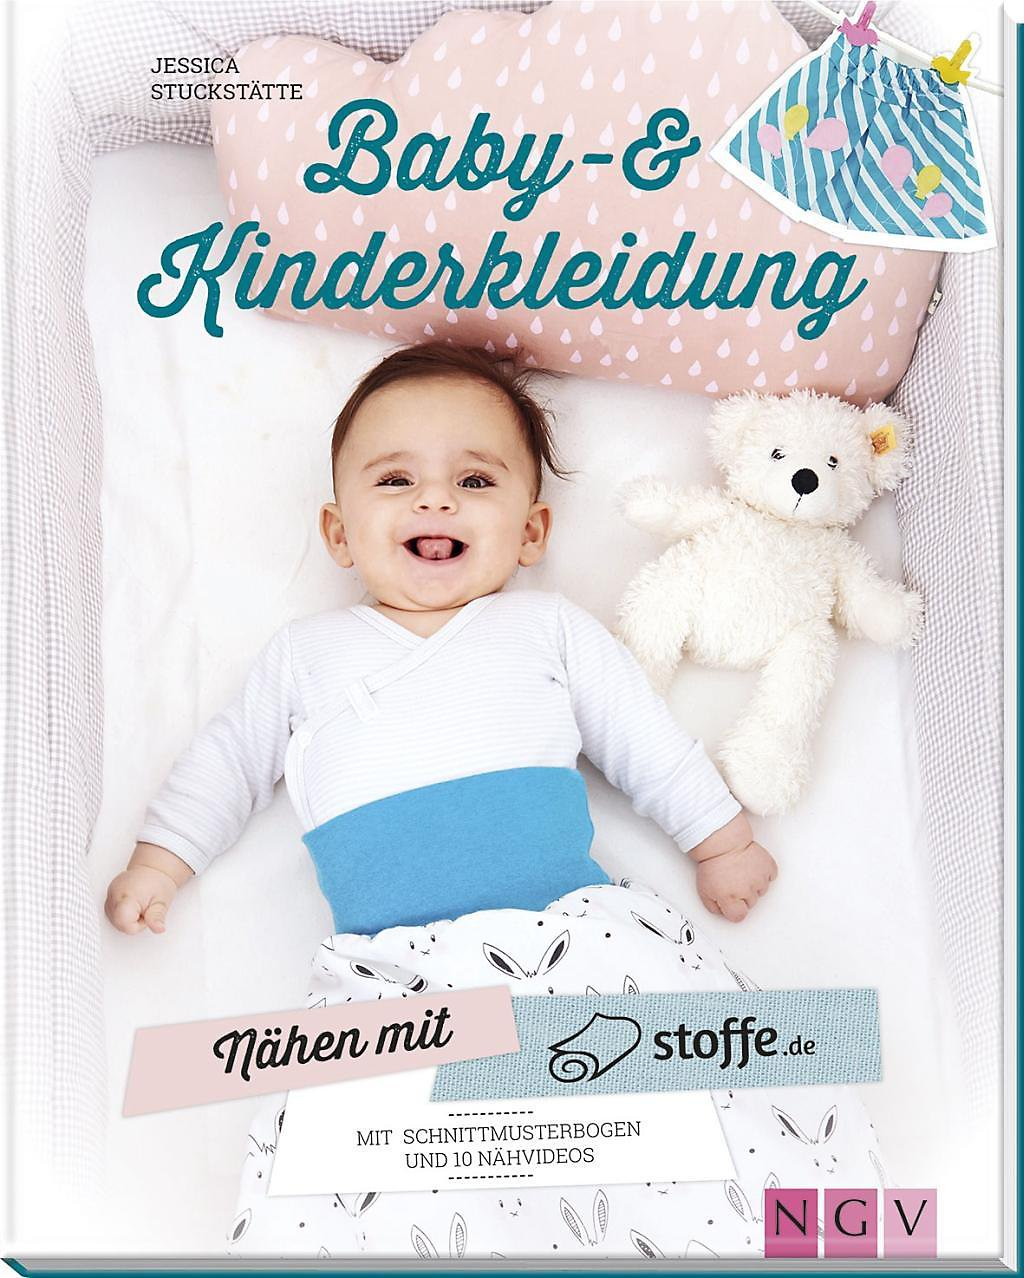 623841a61e956f Nähen mit stoffe.de - Baby-   Kinderkleidung Buch - Weltbild.at